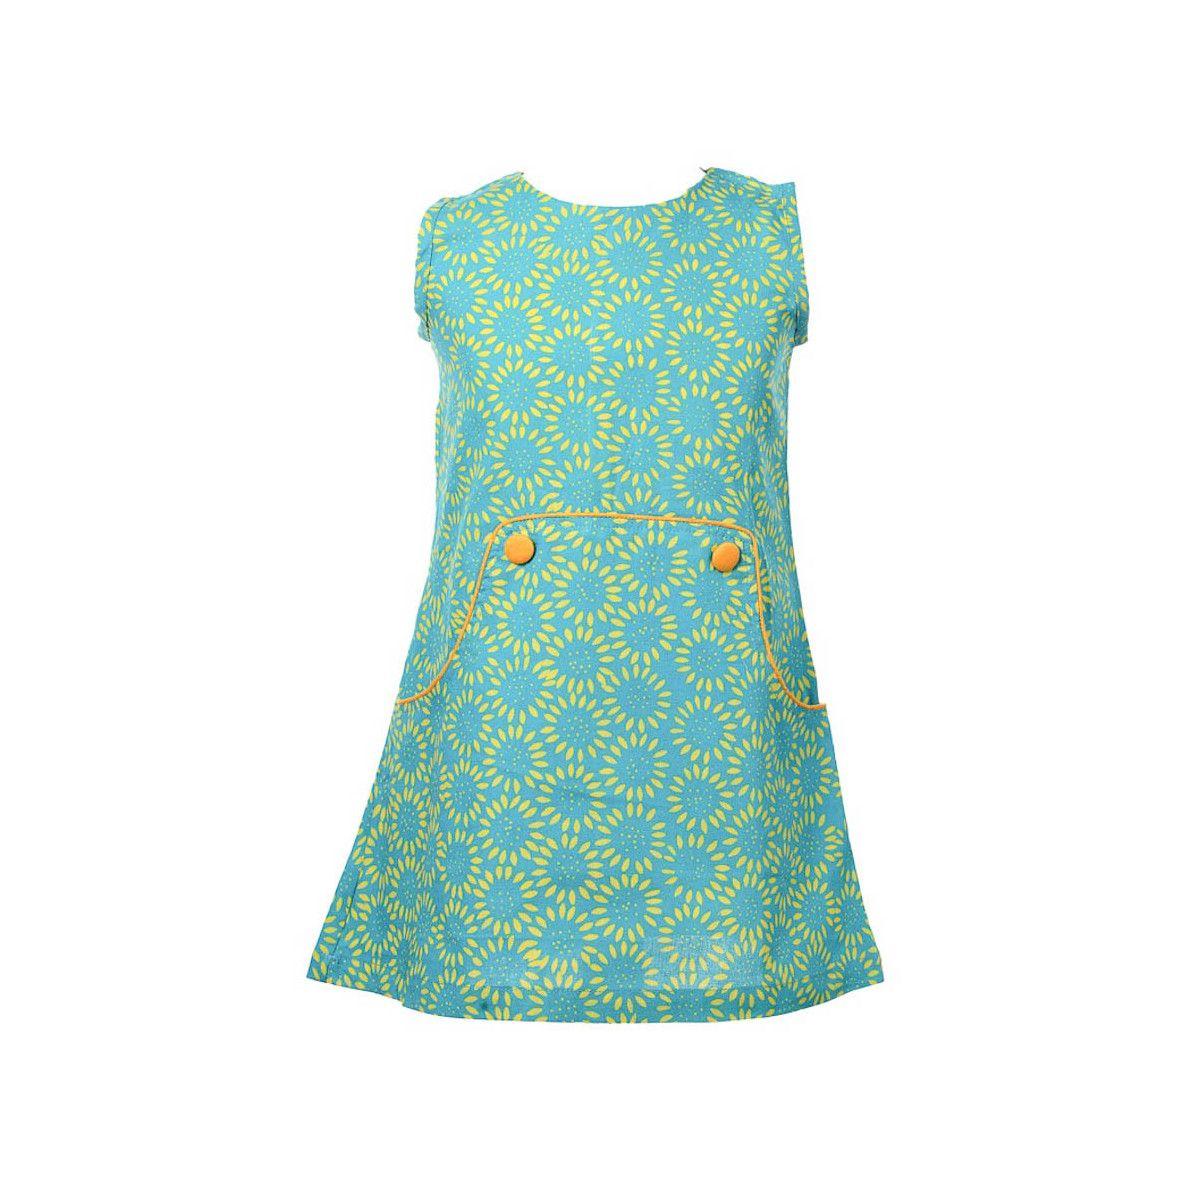 Robe manches courtes coton fille 2-10 ans bleu vert turquoise